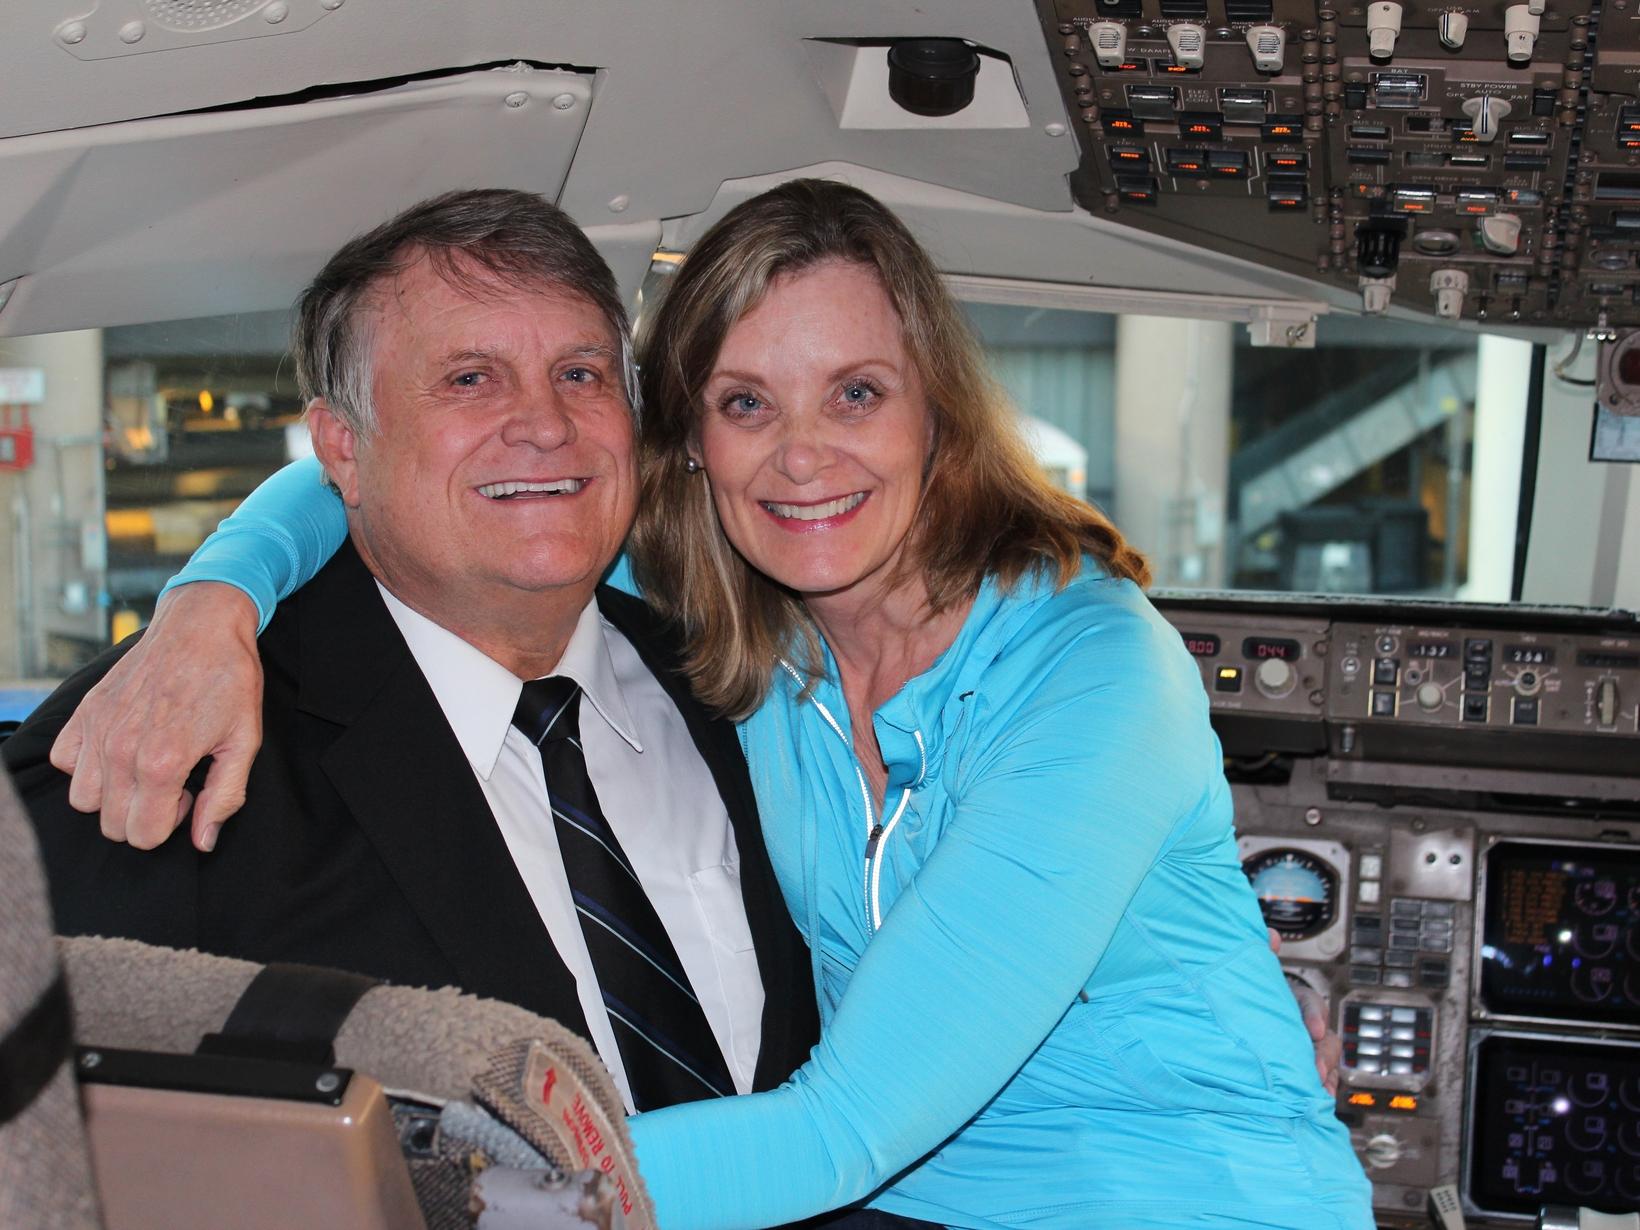 Craig & Leann from Phoenix, Arizona, United States